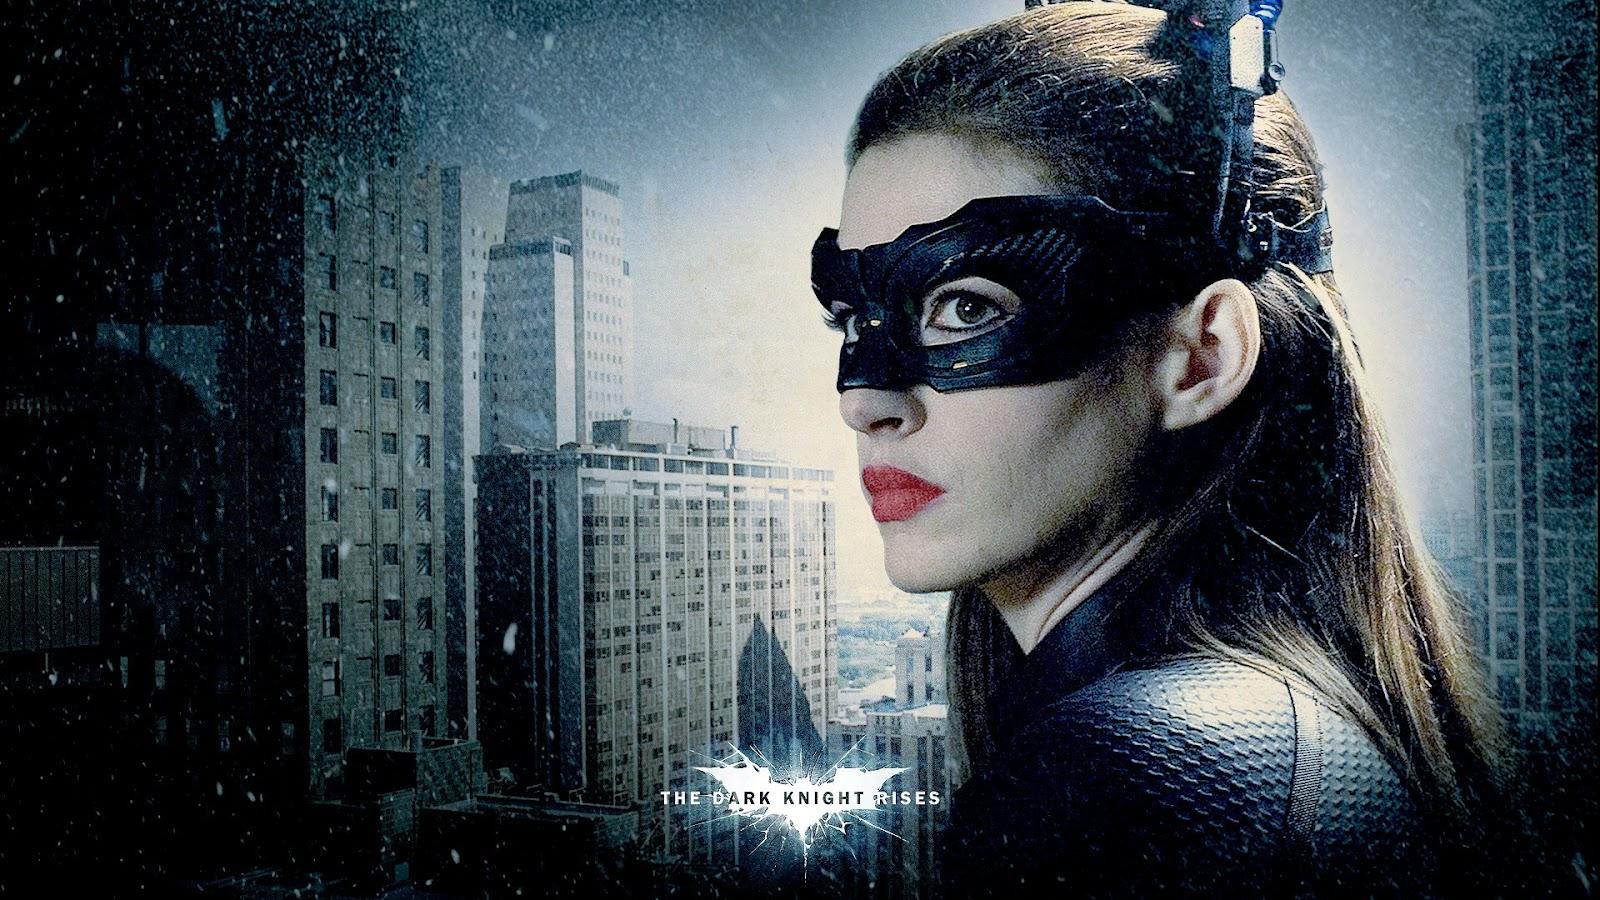 http://1.bp.blogspot.com/-Fc9Oh7MPK2U/UBlJp2LbEiI/AAAAAAAAE4c/fWI7rdSMmZU/s0/Anne-Hathaway-Catwoman-The-Dark-Knight-Rises.jpg